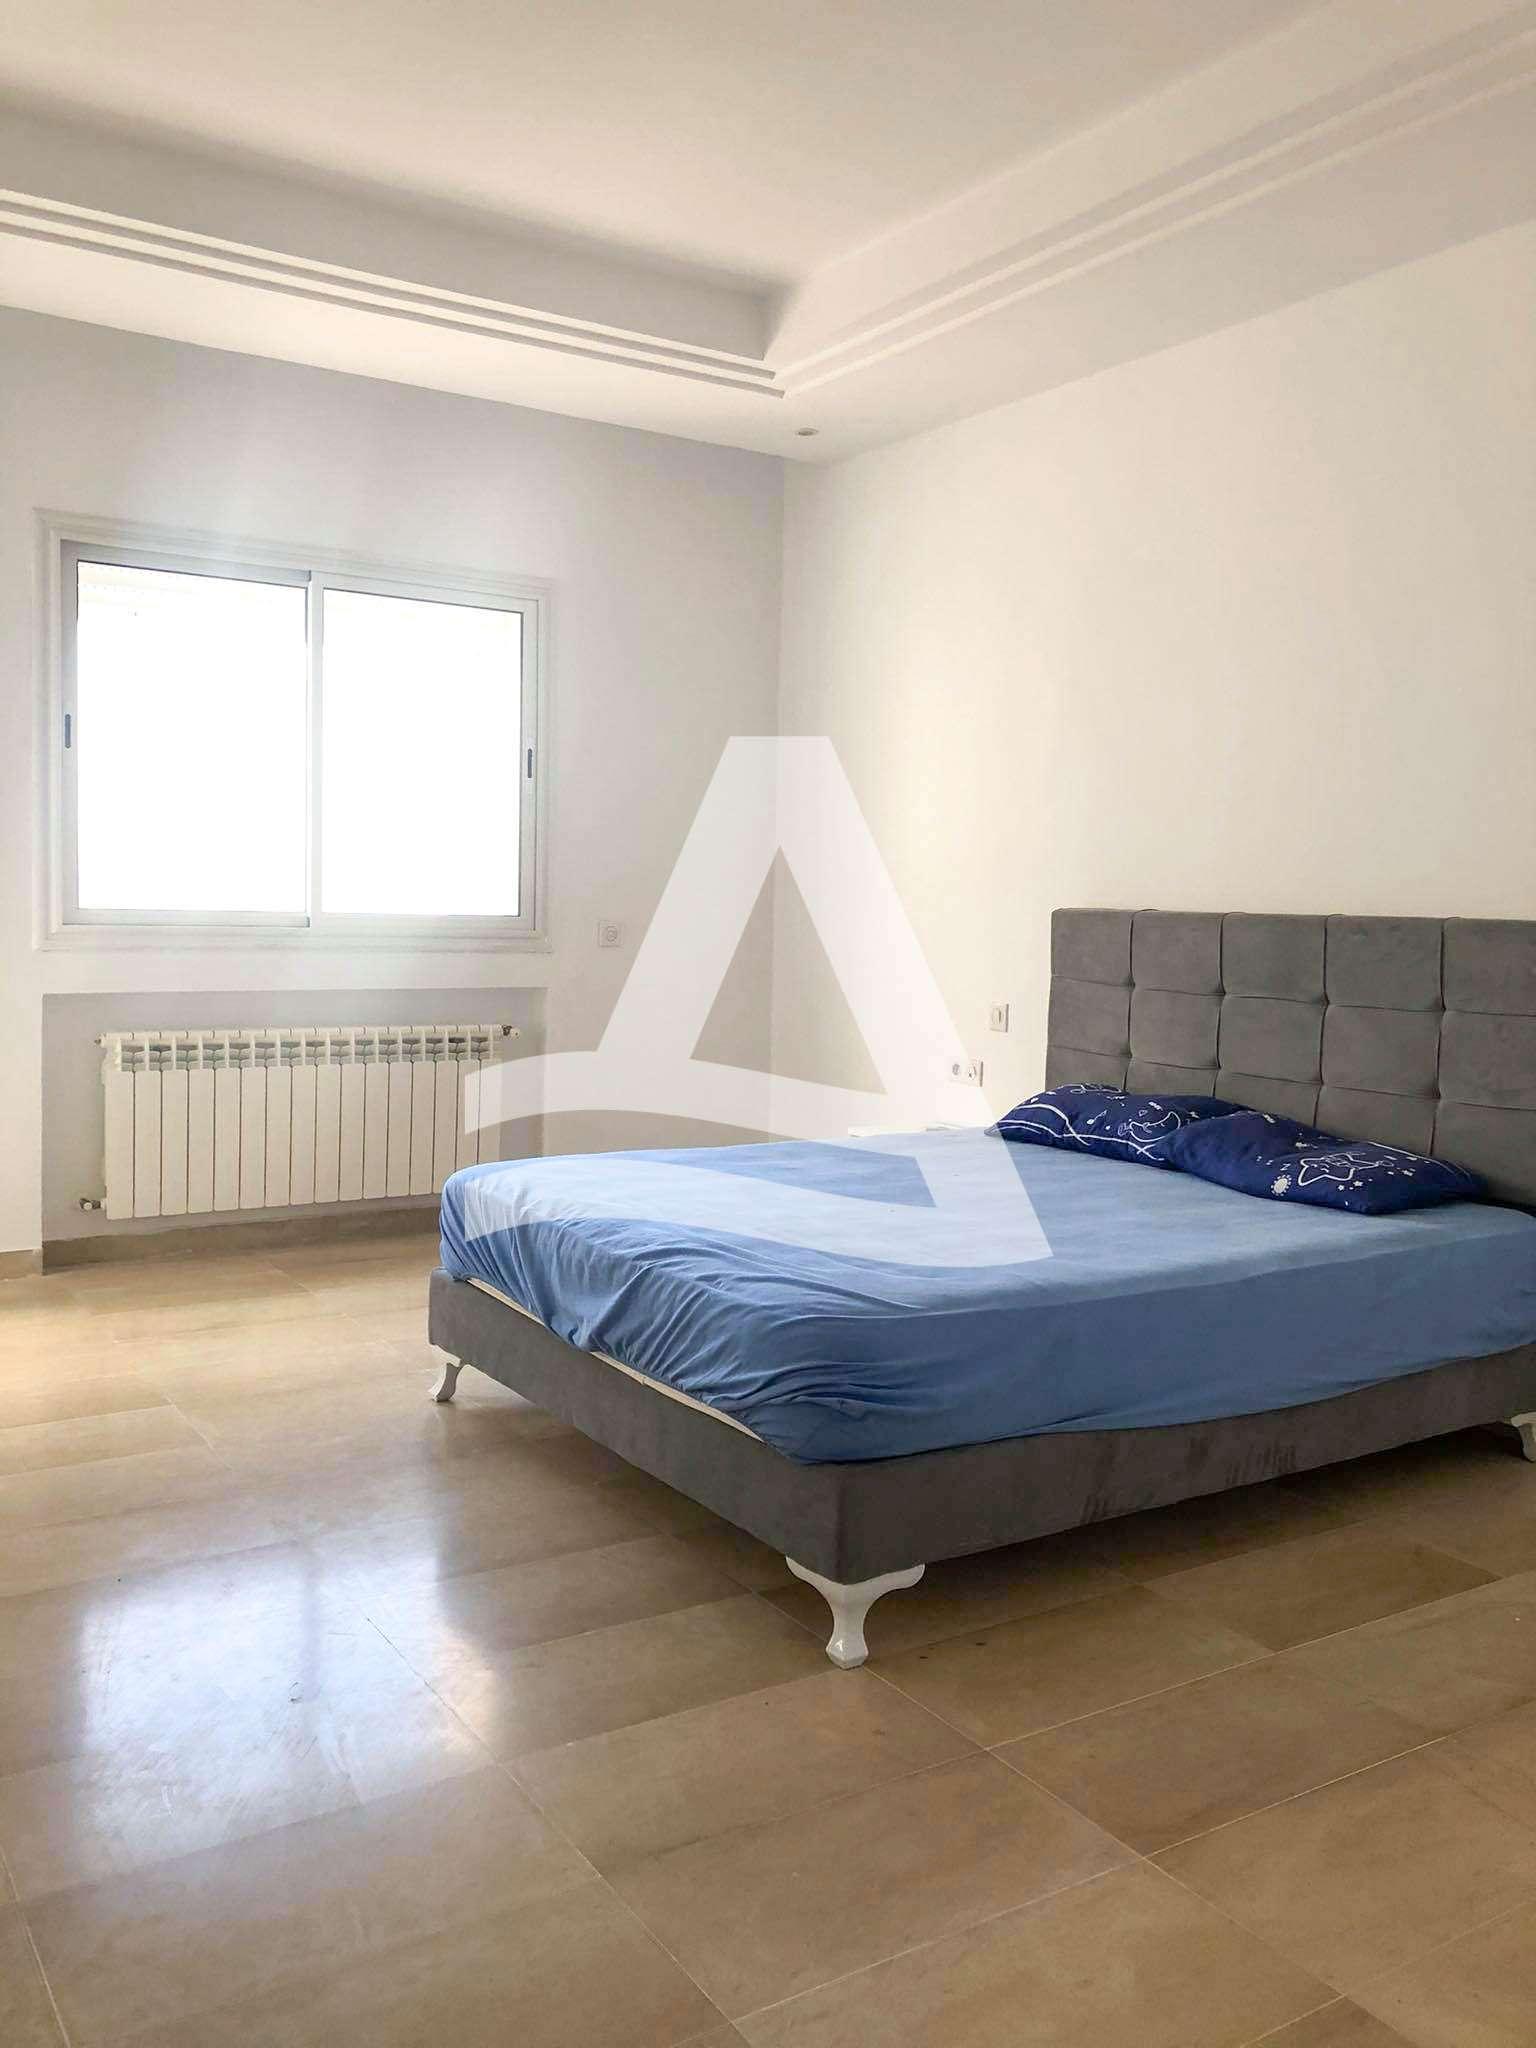 httpss3.amazonaws.comlogimoaws14023399221613387591appartement_jardin_de_carthage_13_sur_13